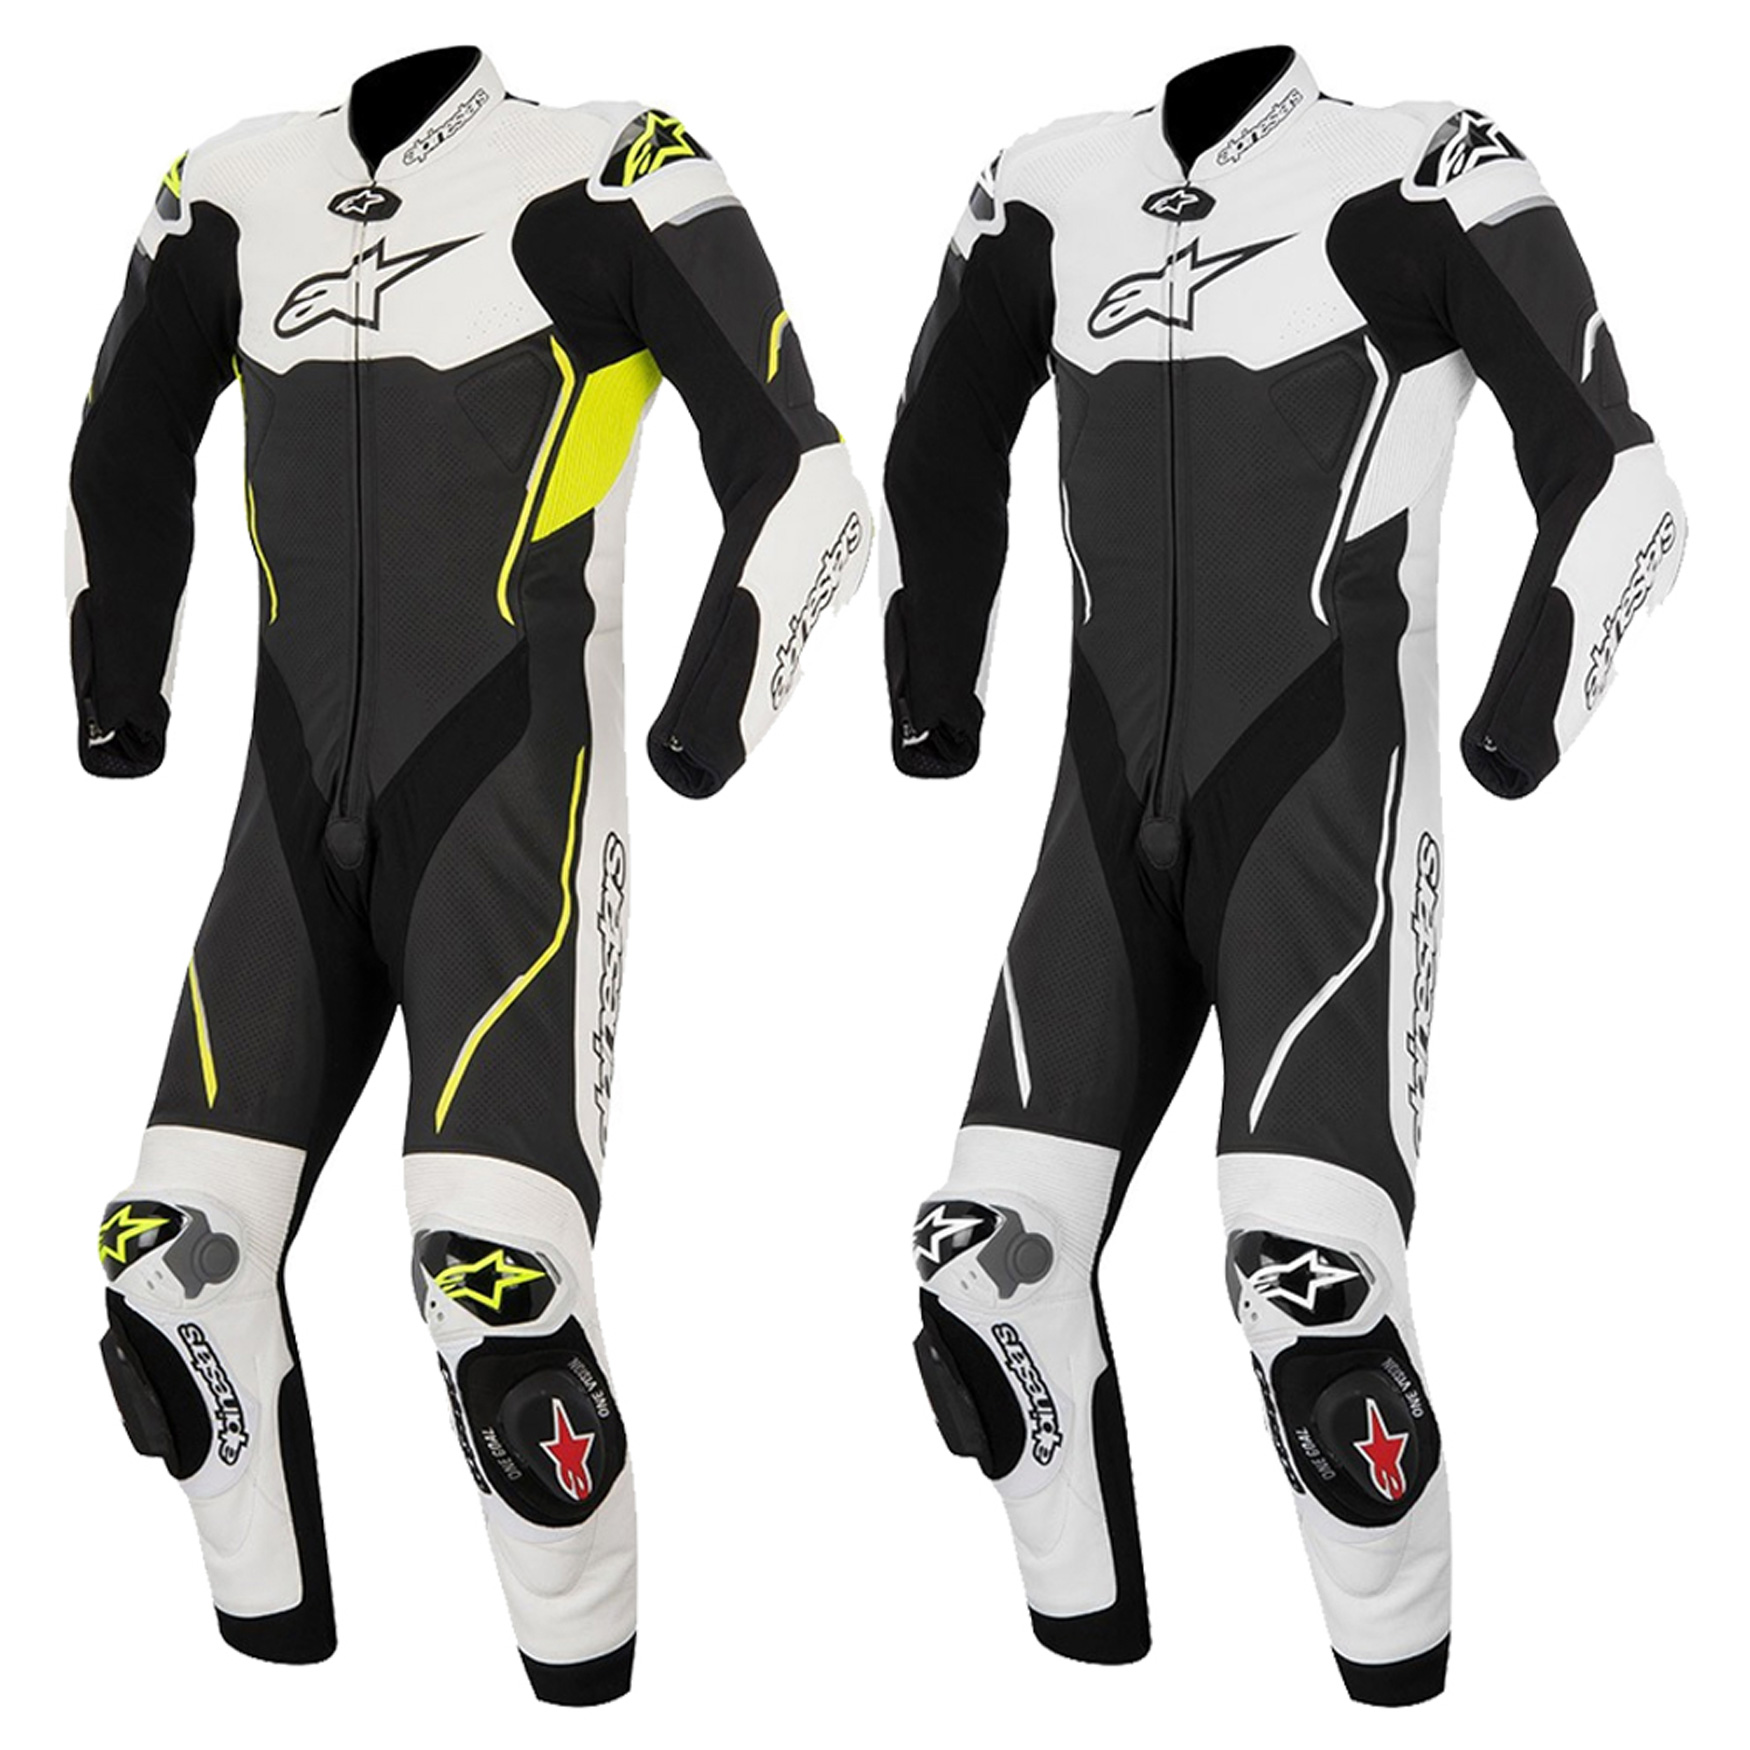 New Alpinestars Motorcycle Bike Atem Leather Racing Full Body Suit